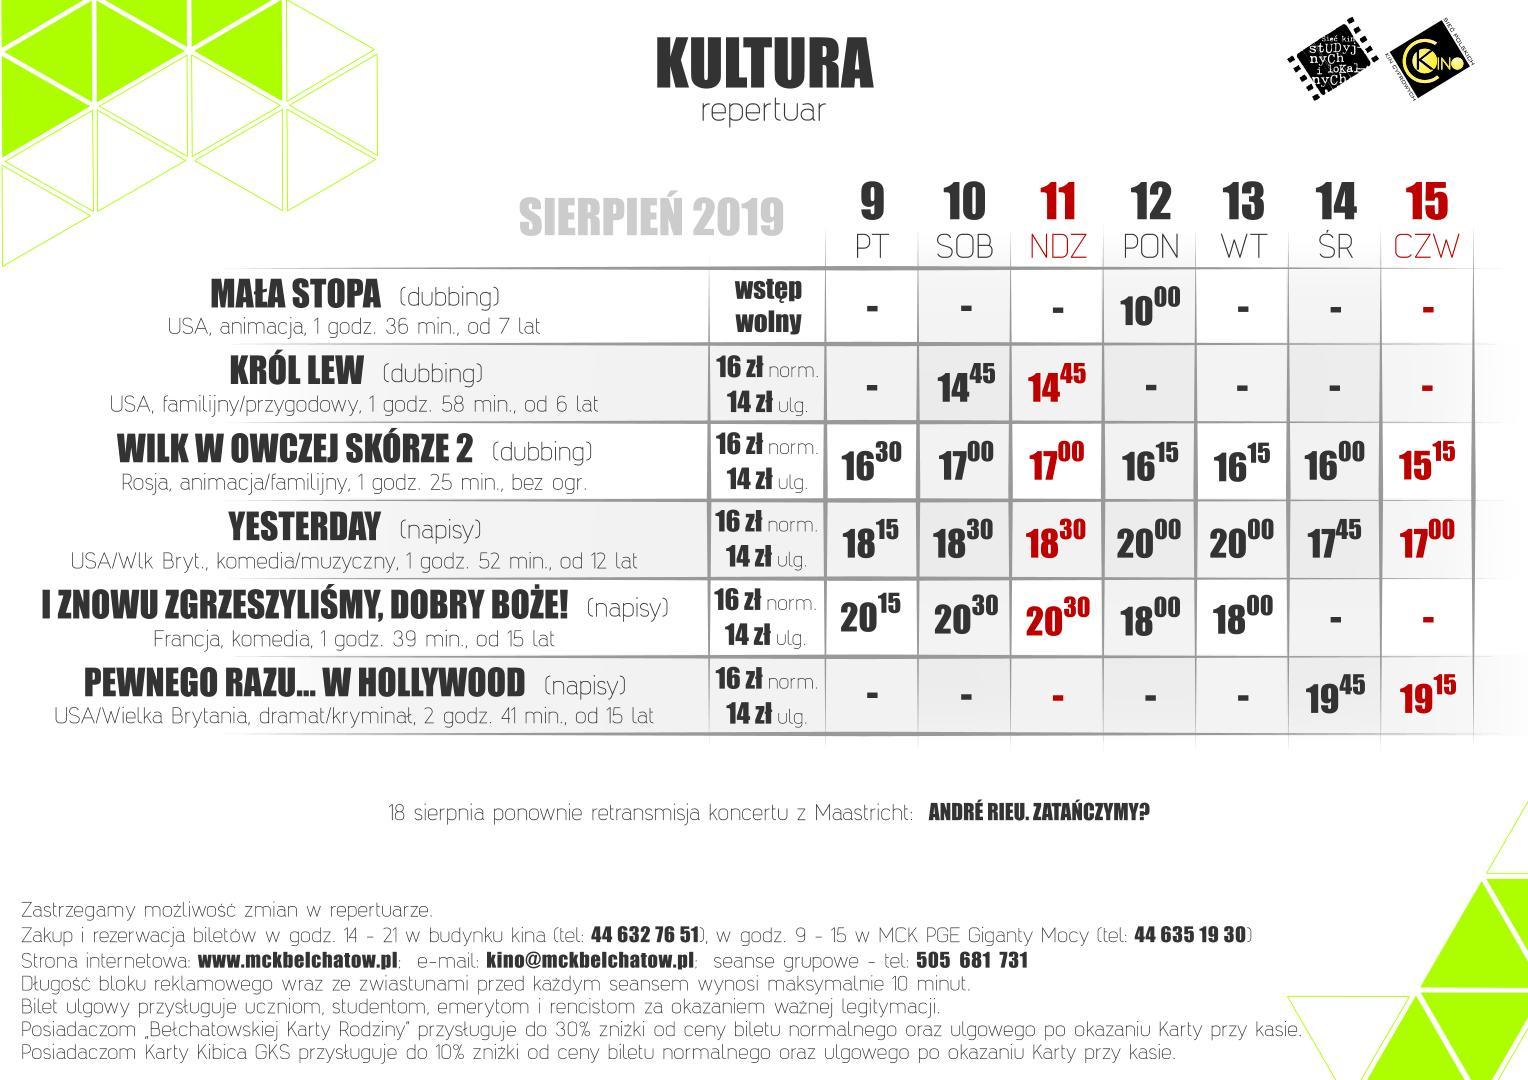 https://www.mckbelchatow.pl/kino-kultura/repertuar/2019/08/2/kultura-repertuar-2019-08-09_hd.jpg